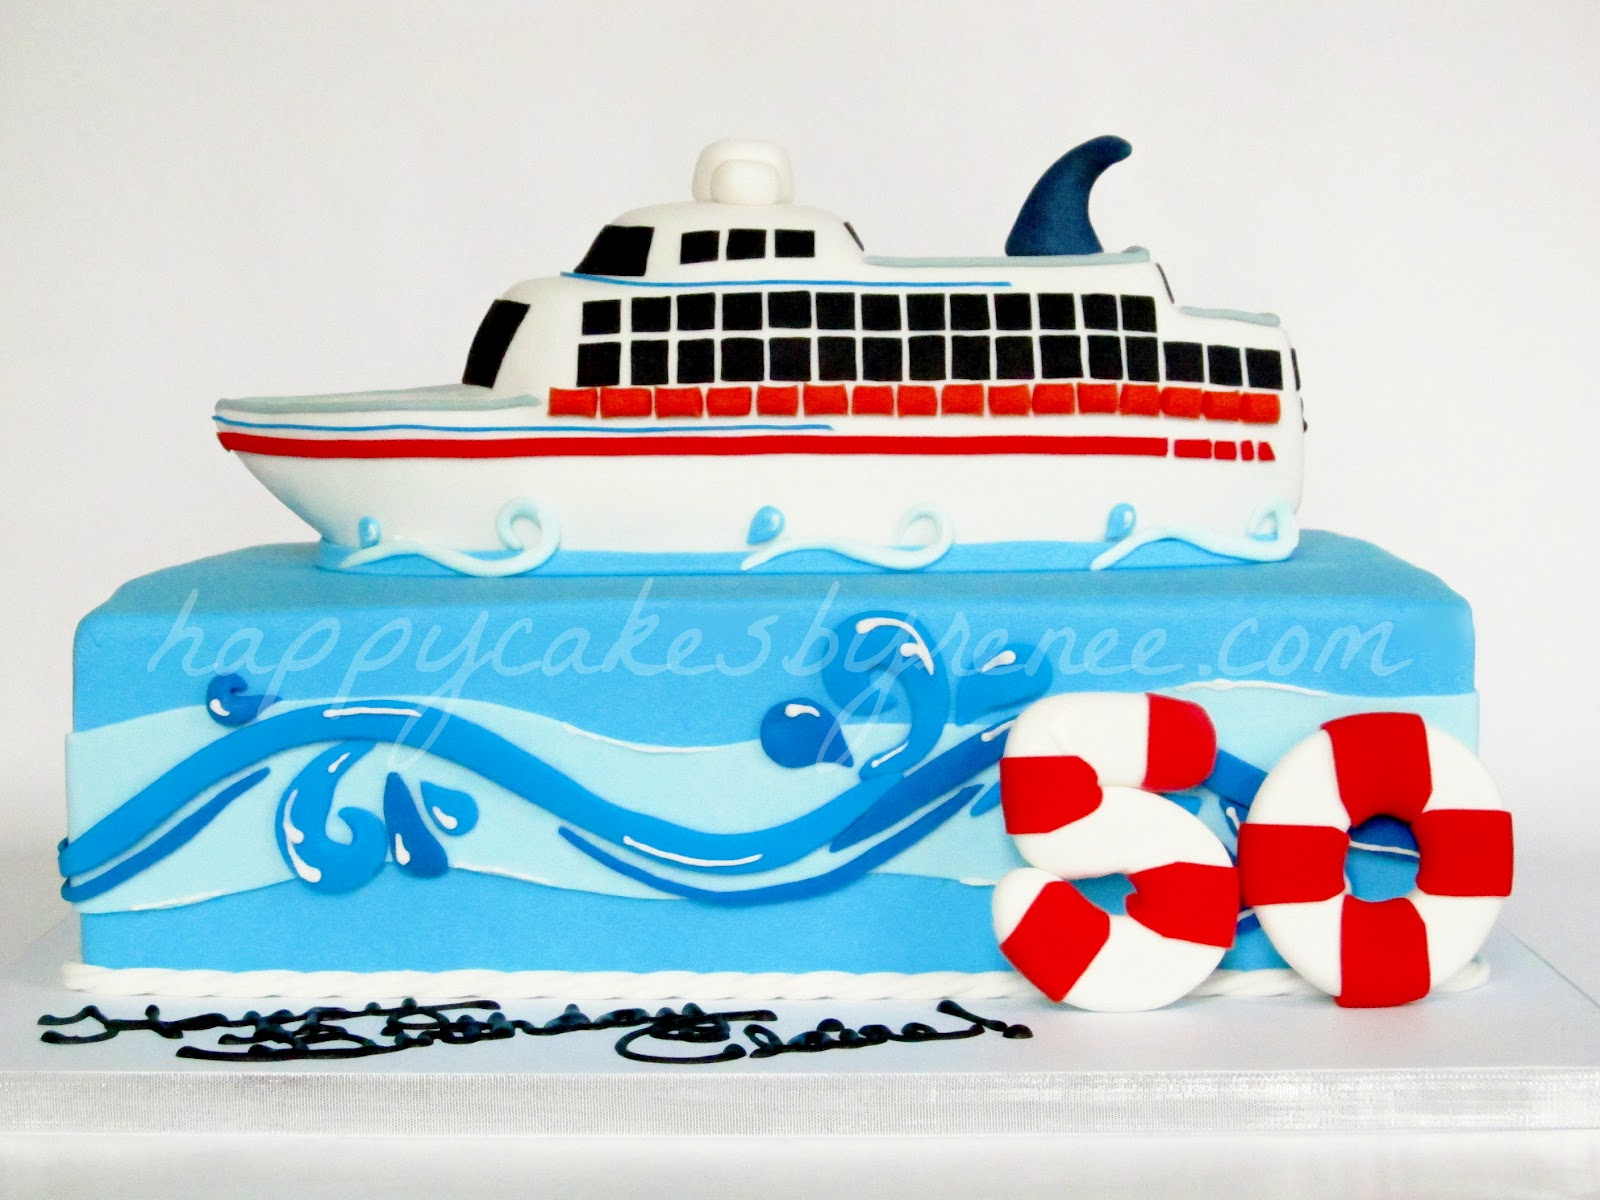 Th Birthday Cruise Ship Cake Renee Conner Cake Design - My cruise ship